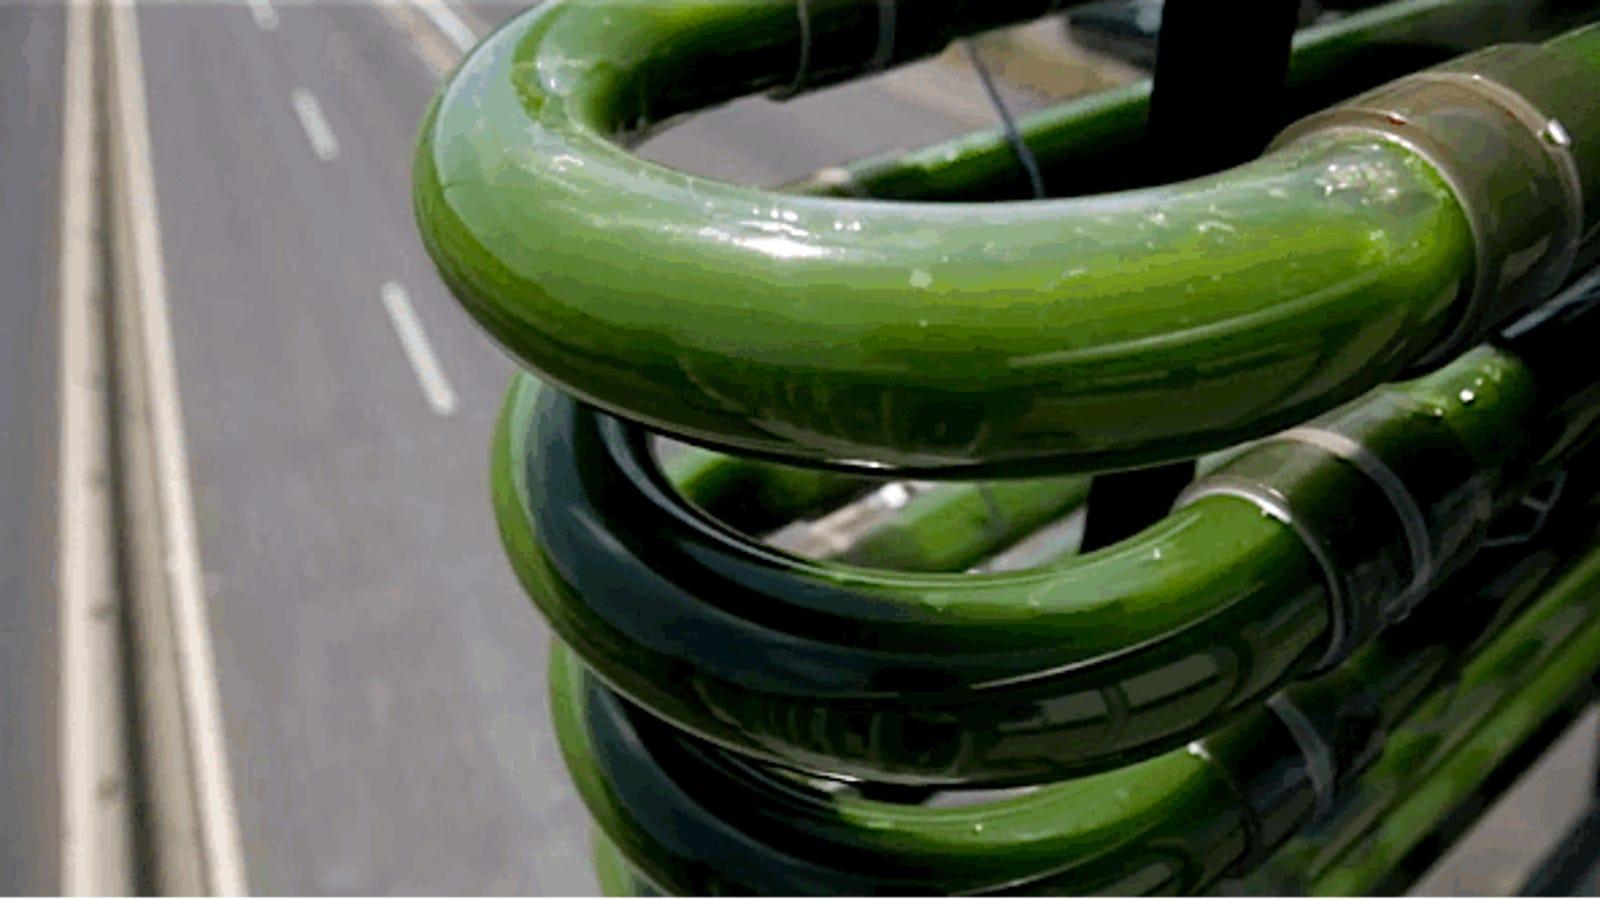 Un genial experimento: cultivar algas en autopistas para reciclar CO2